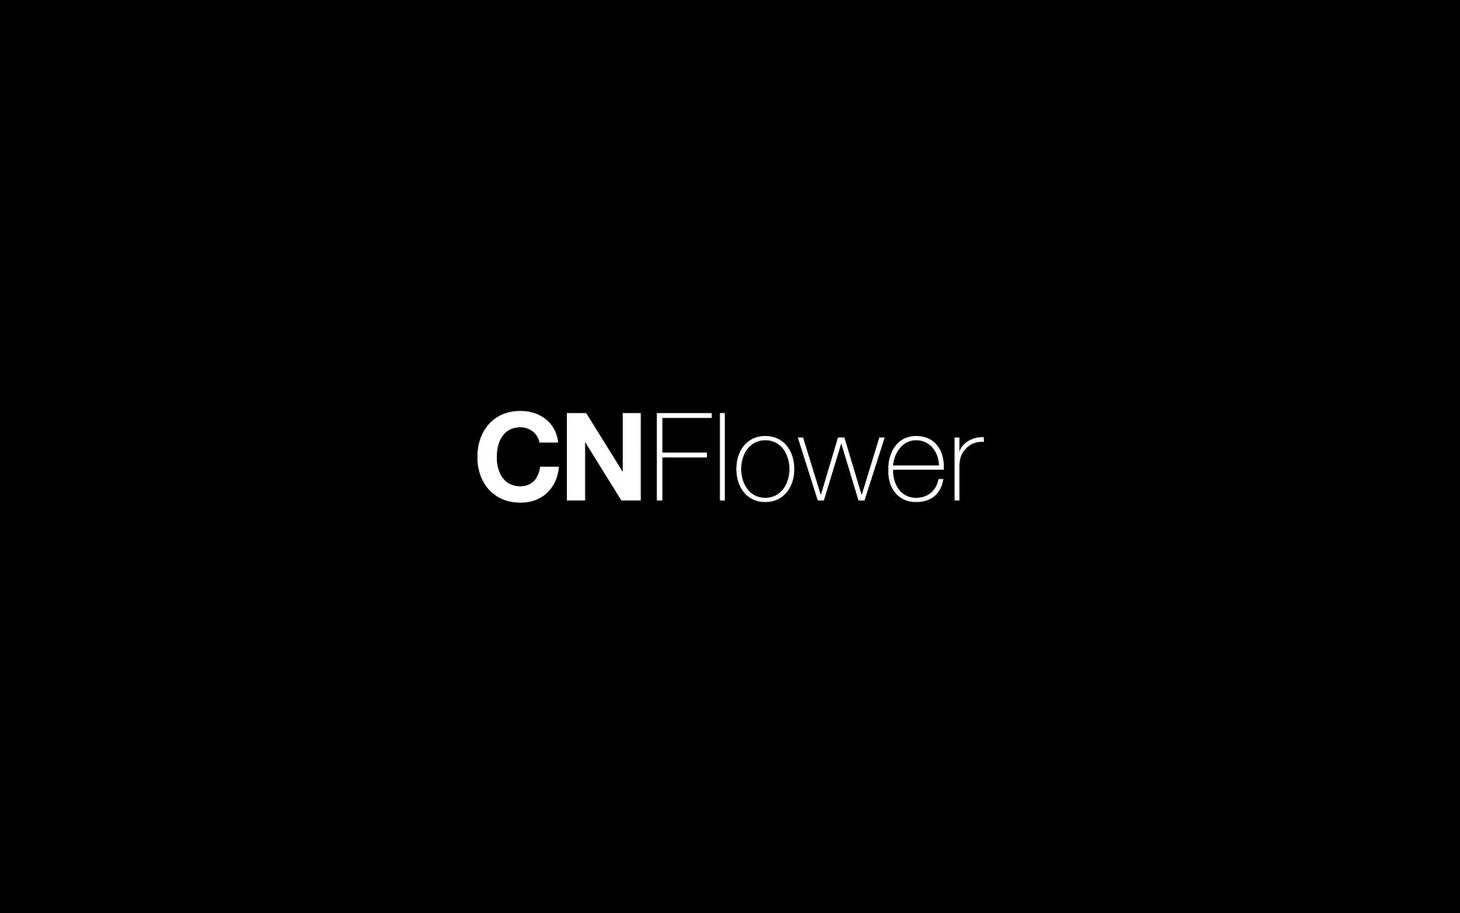 CNF_1960X1225_1.jpg